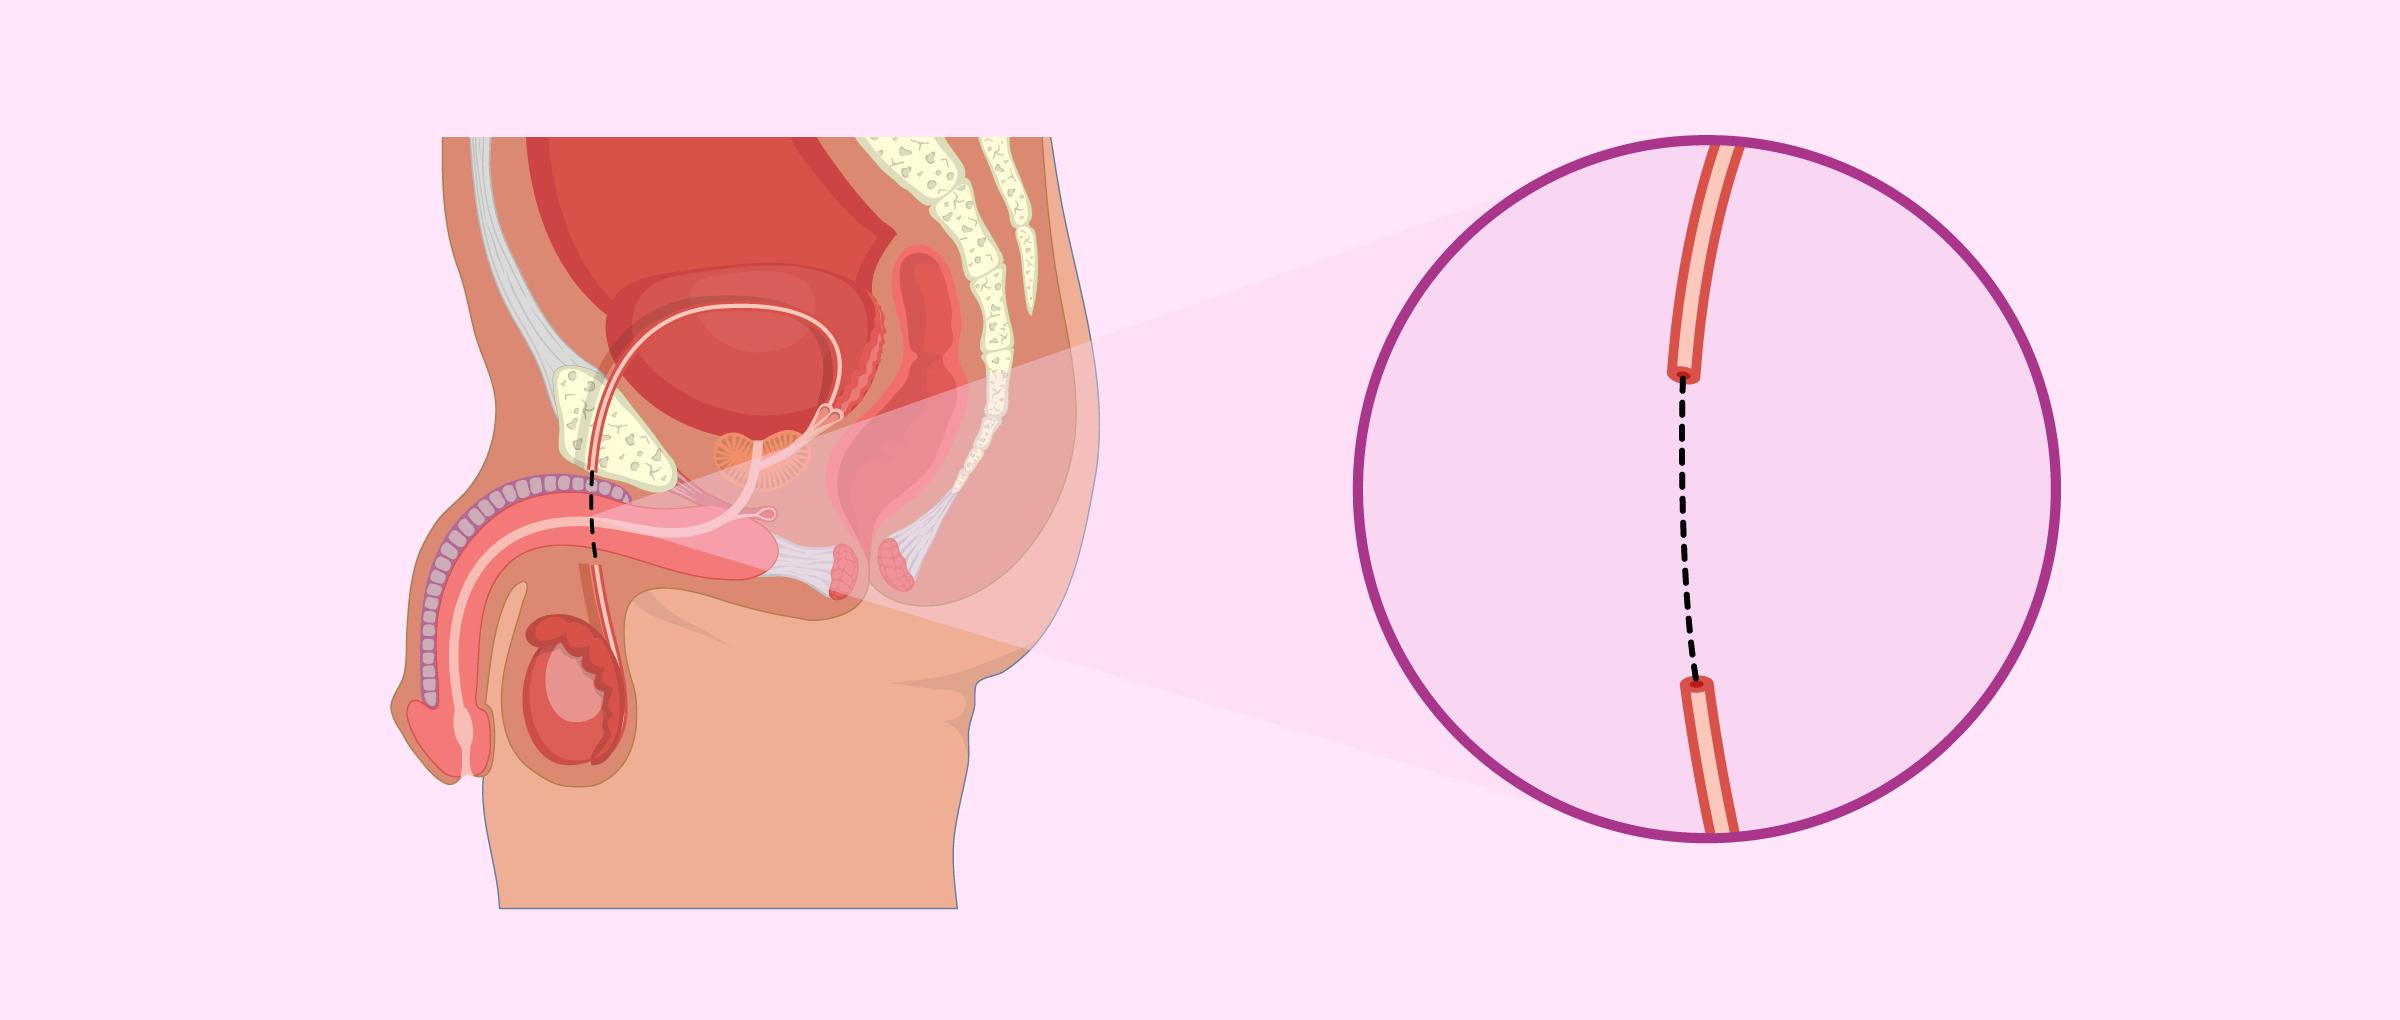 Recanalisation du sperme